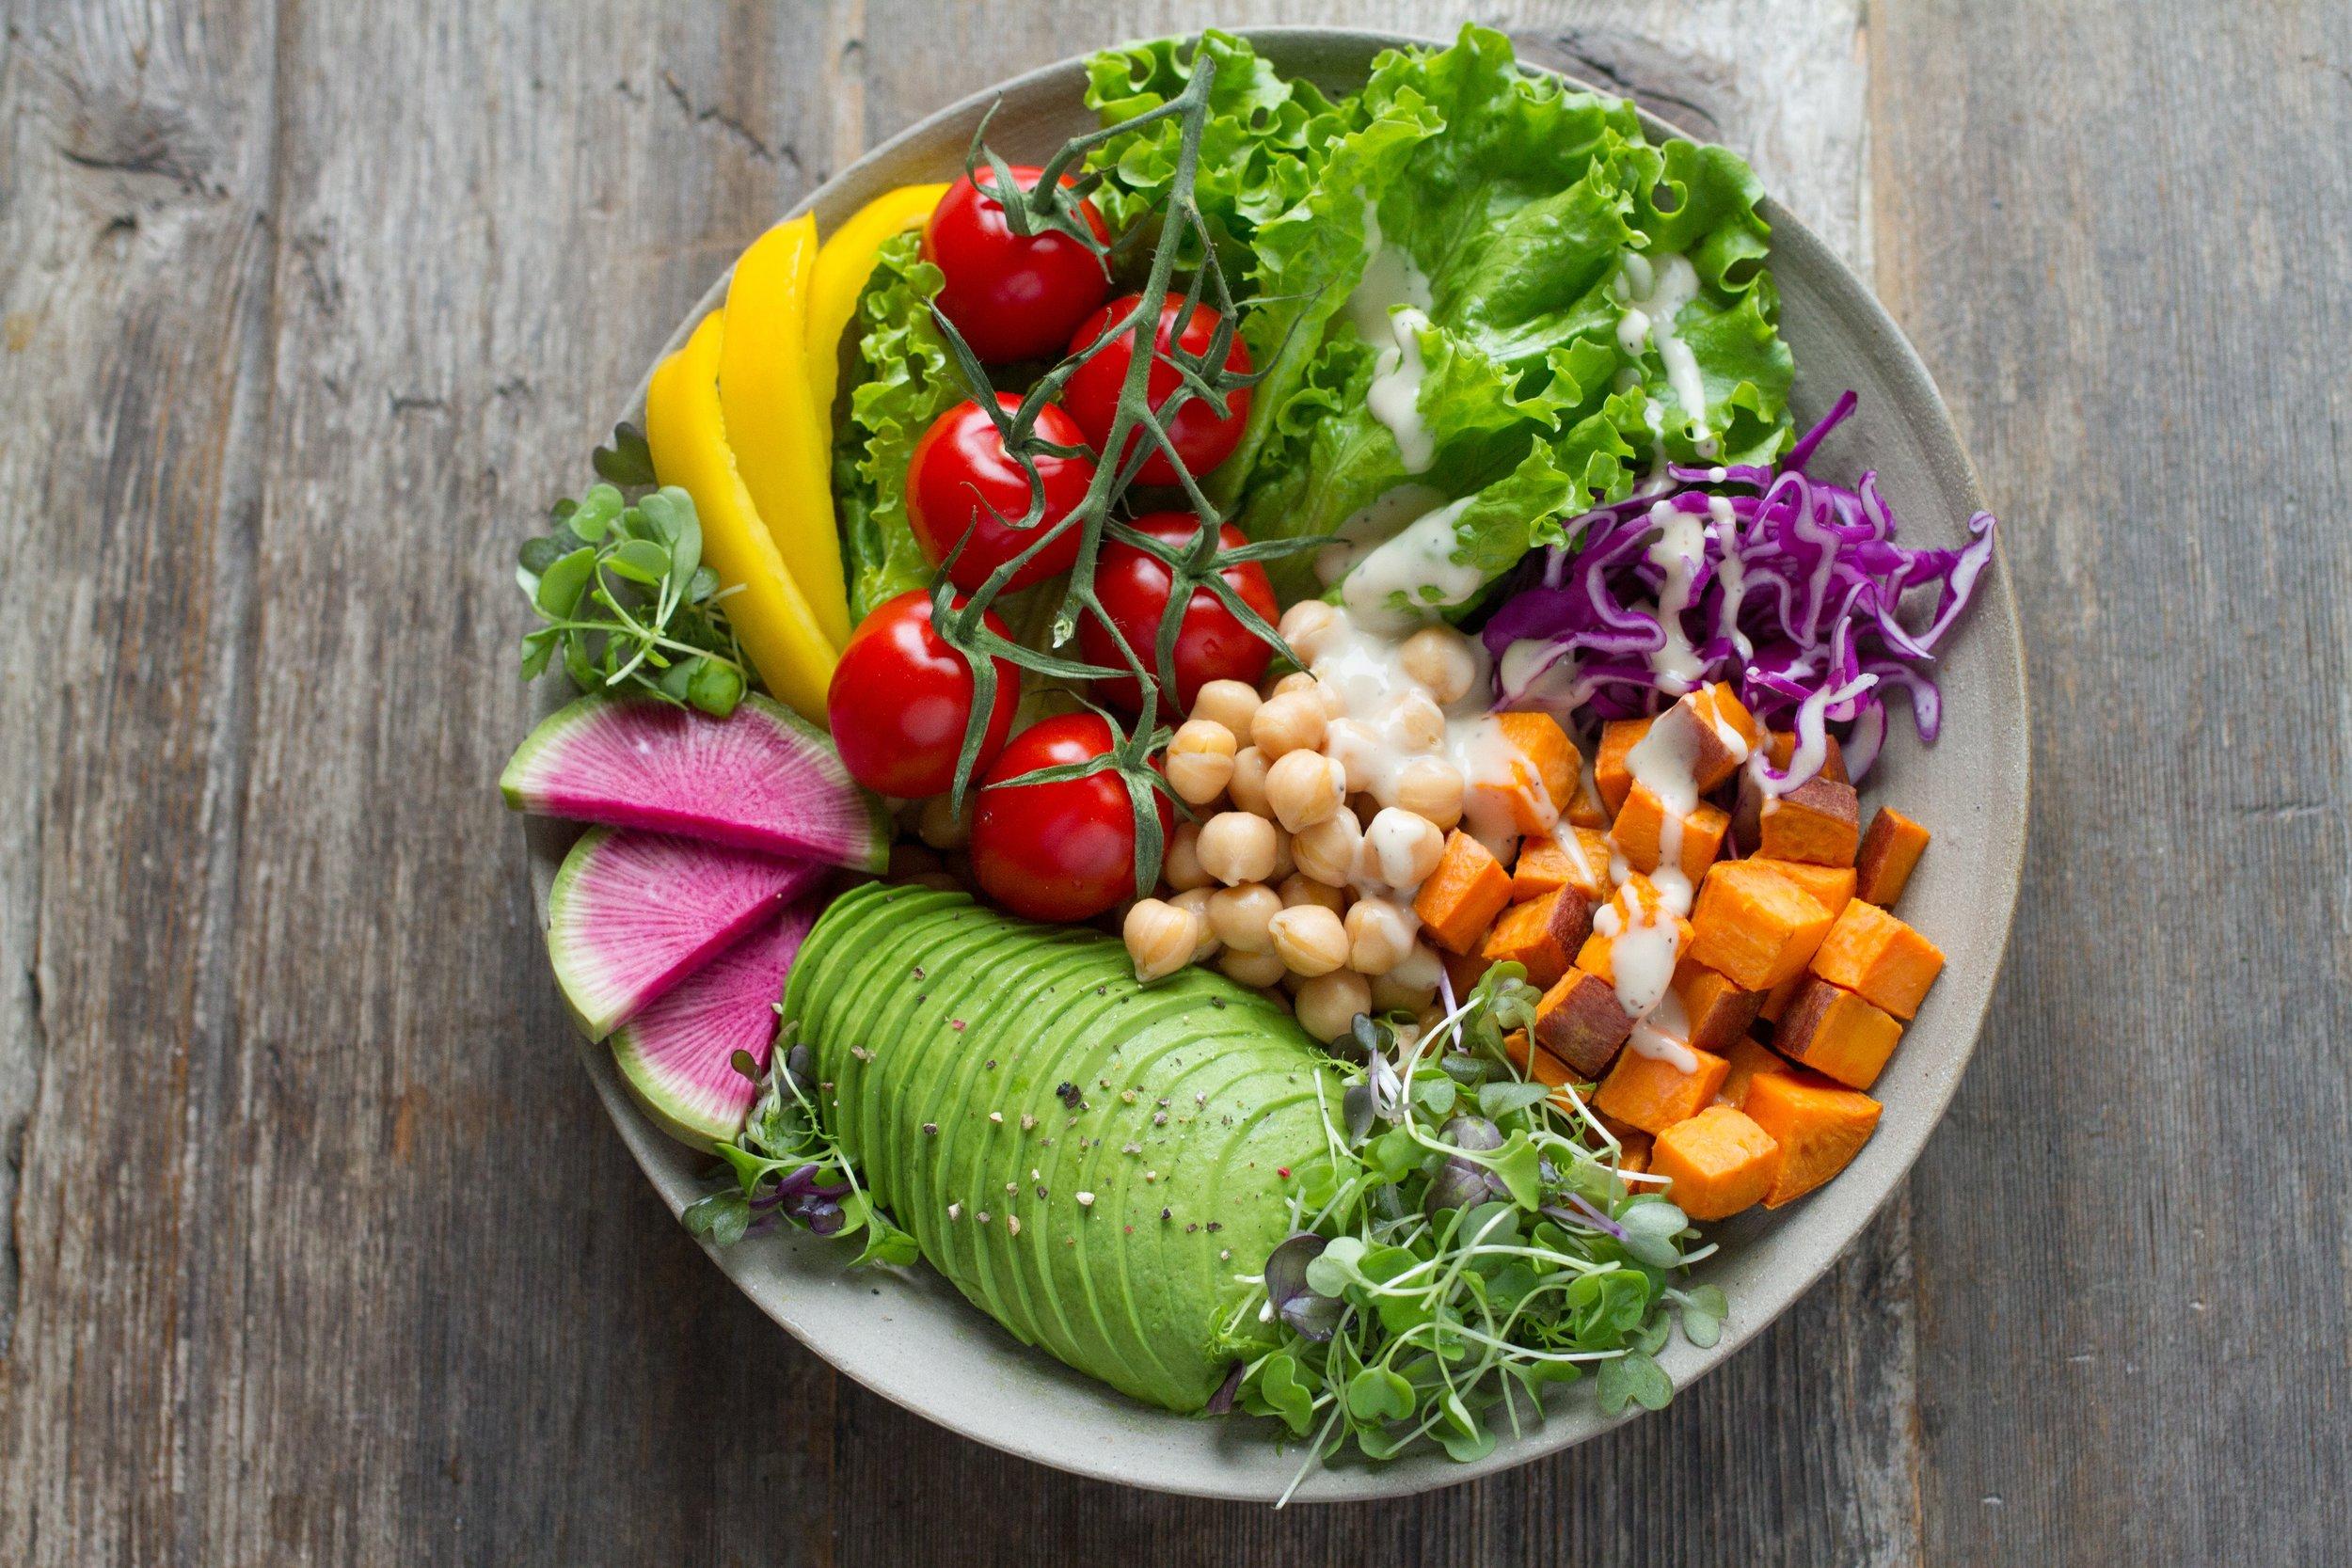 Nutrition Plan 2 image.jpg